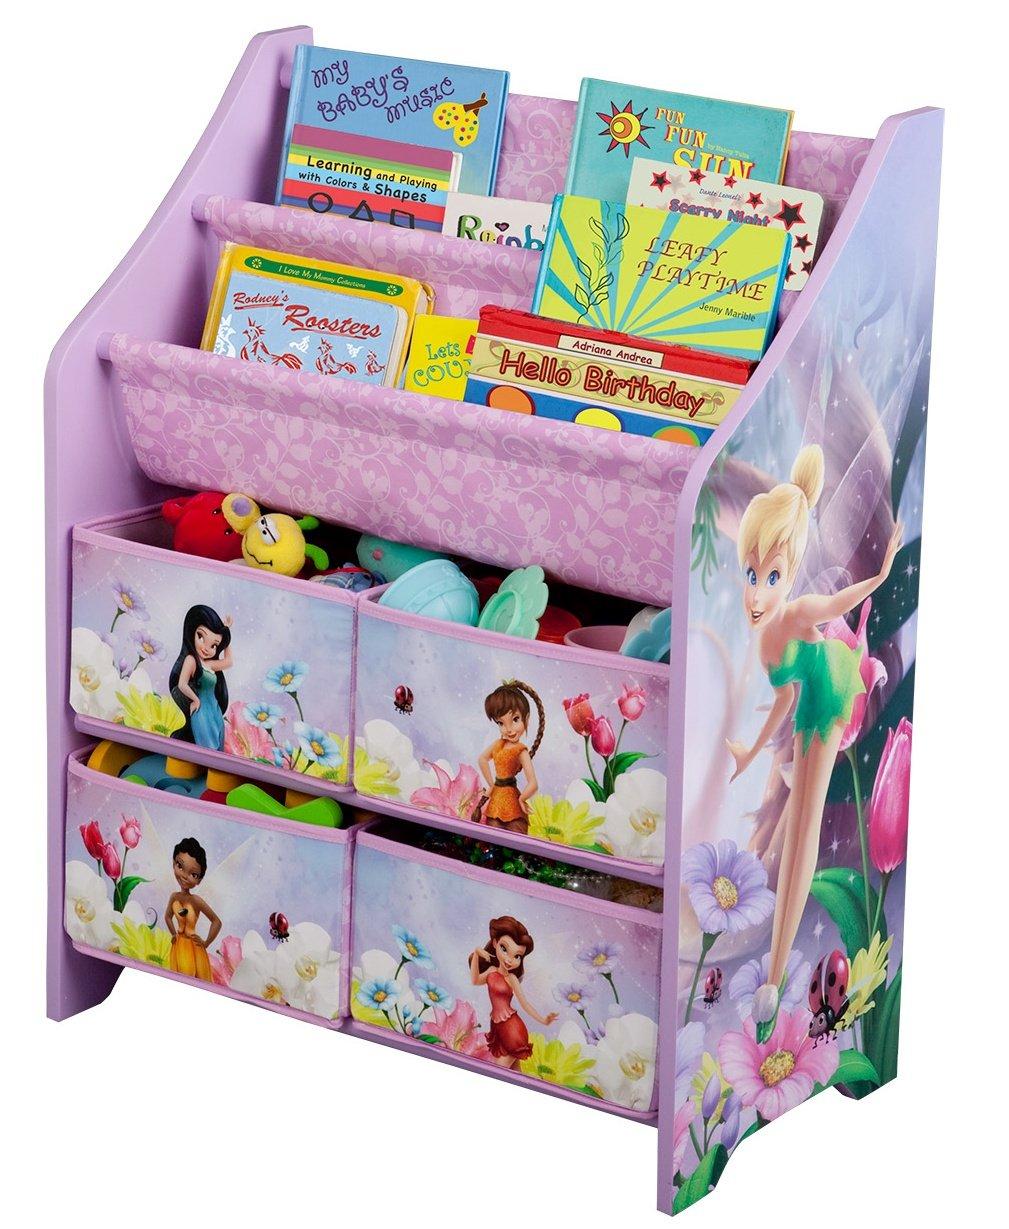 - Amazon.com: Disney Fairies Book And Toy Organizer: Toys & Games